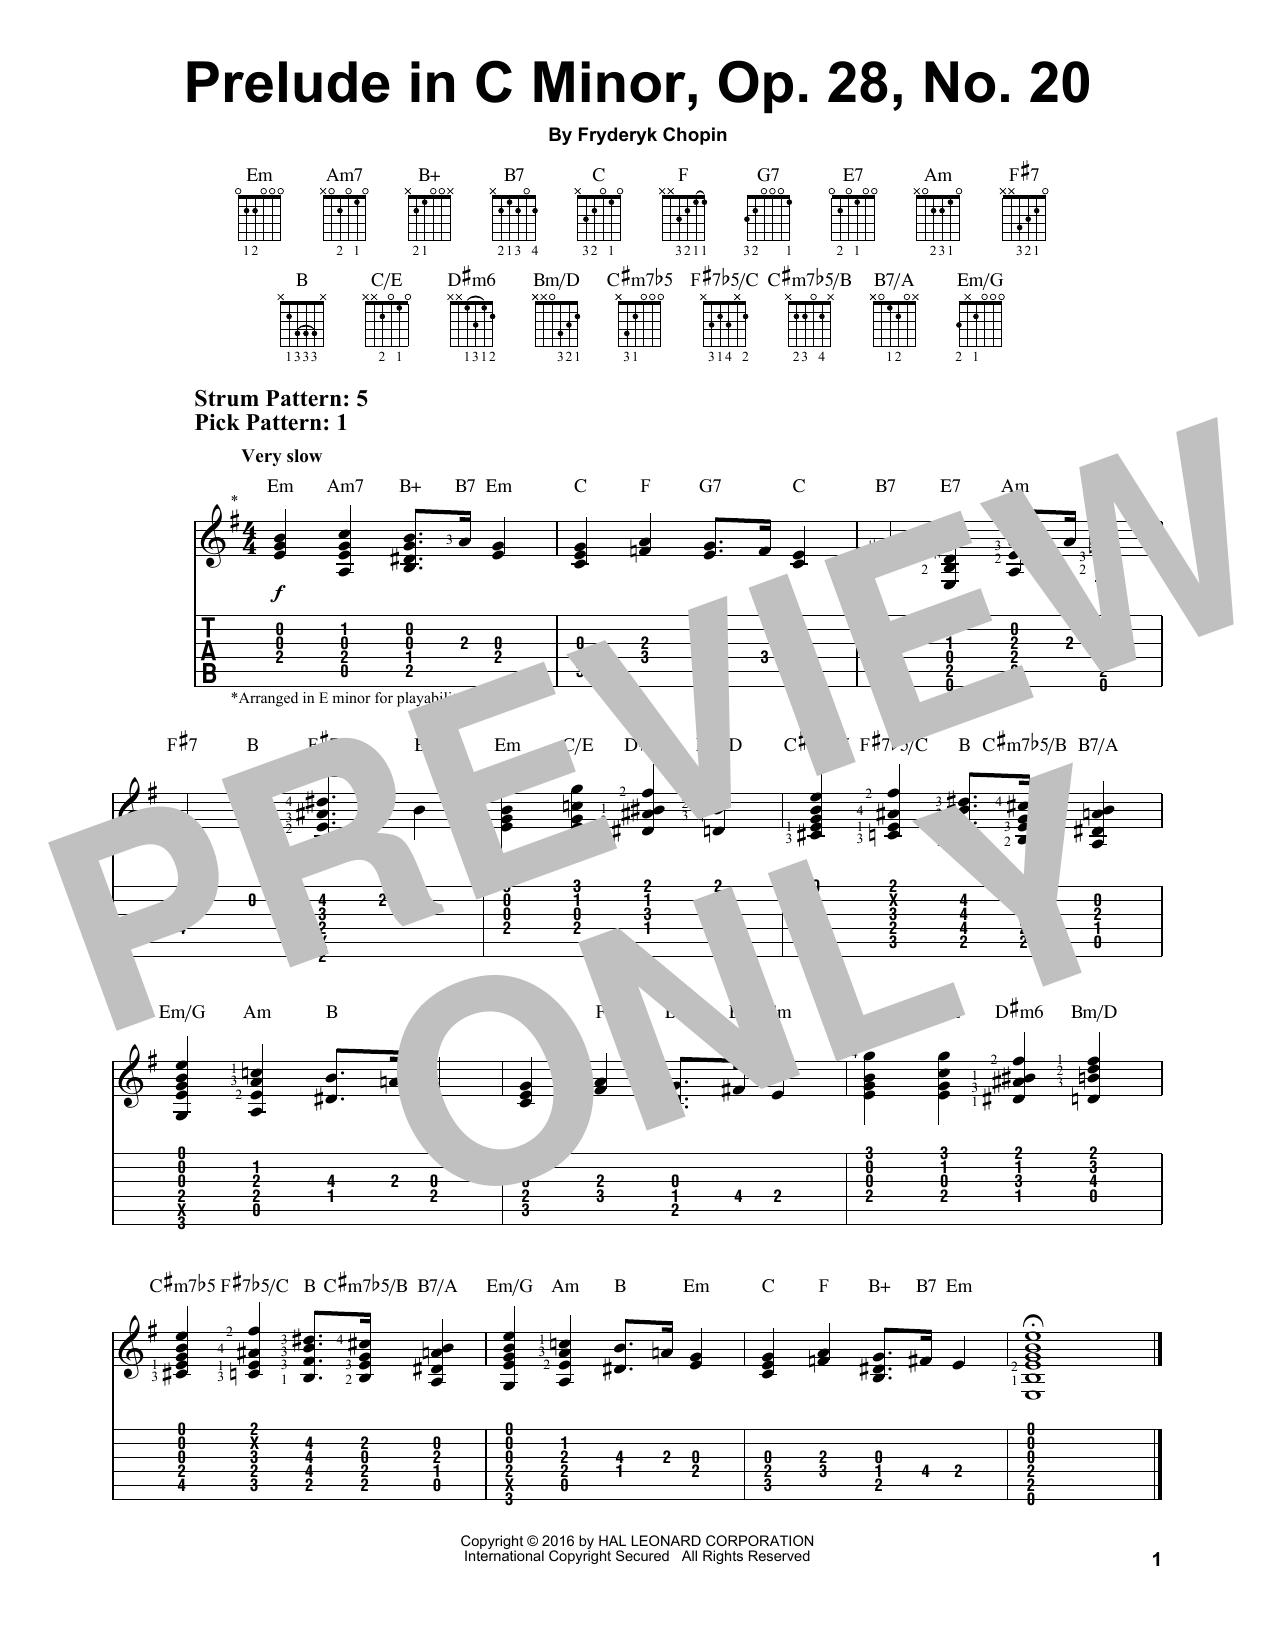 Tablature guitare Prelude In C Minor, Op. 28, No. 20 de Frederic Chopin - Tablature guitare facile